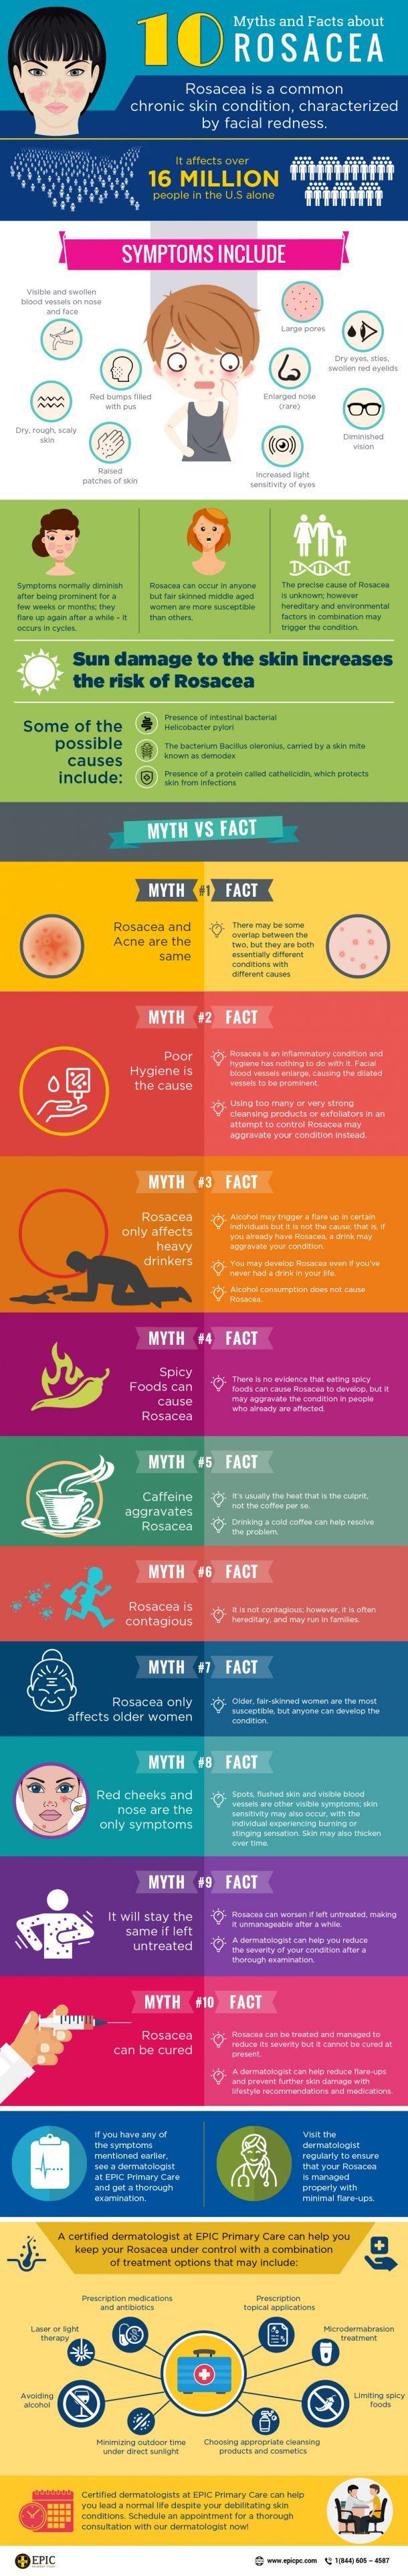 rosacea-myths-facts-symptoms-causes